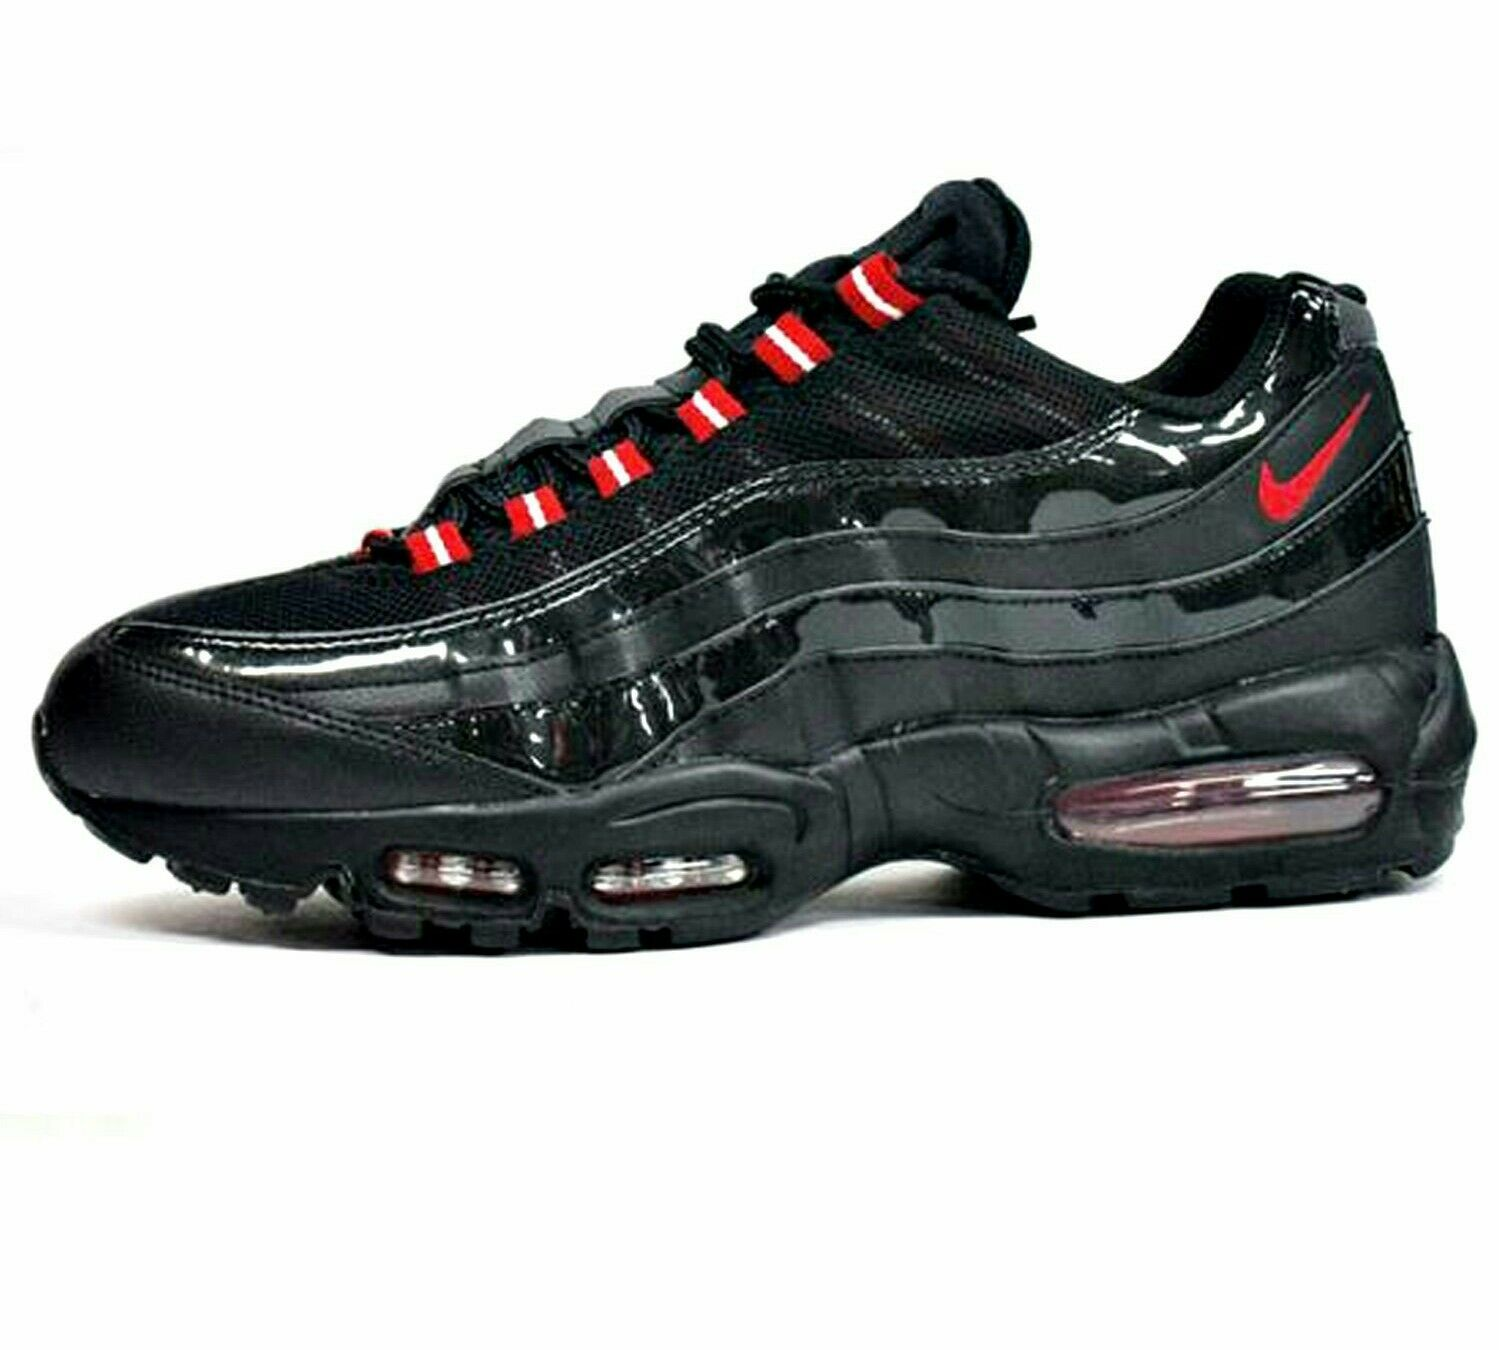 Nike Air Max 95 Black Varsity Red Size 10.5   New